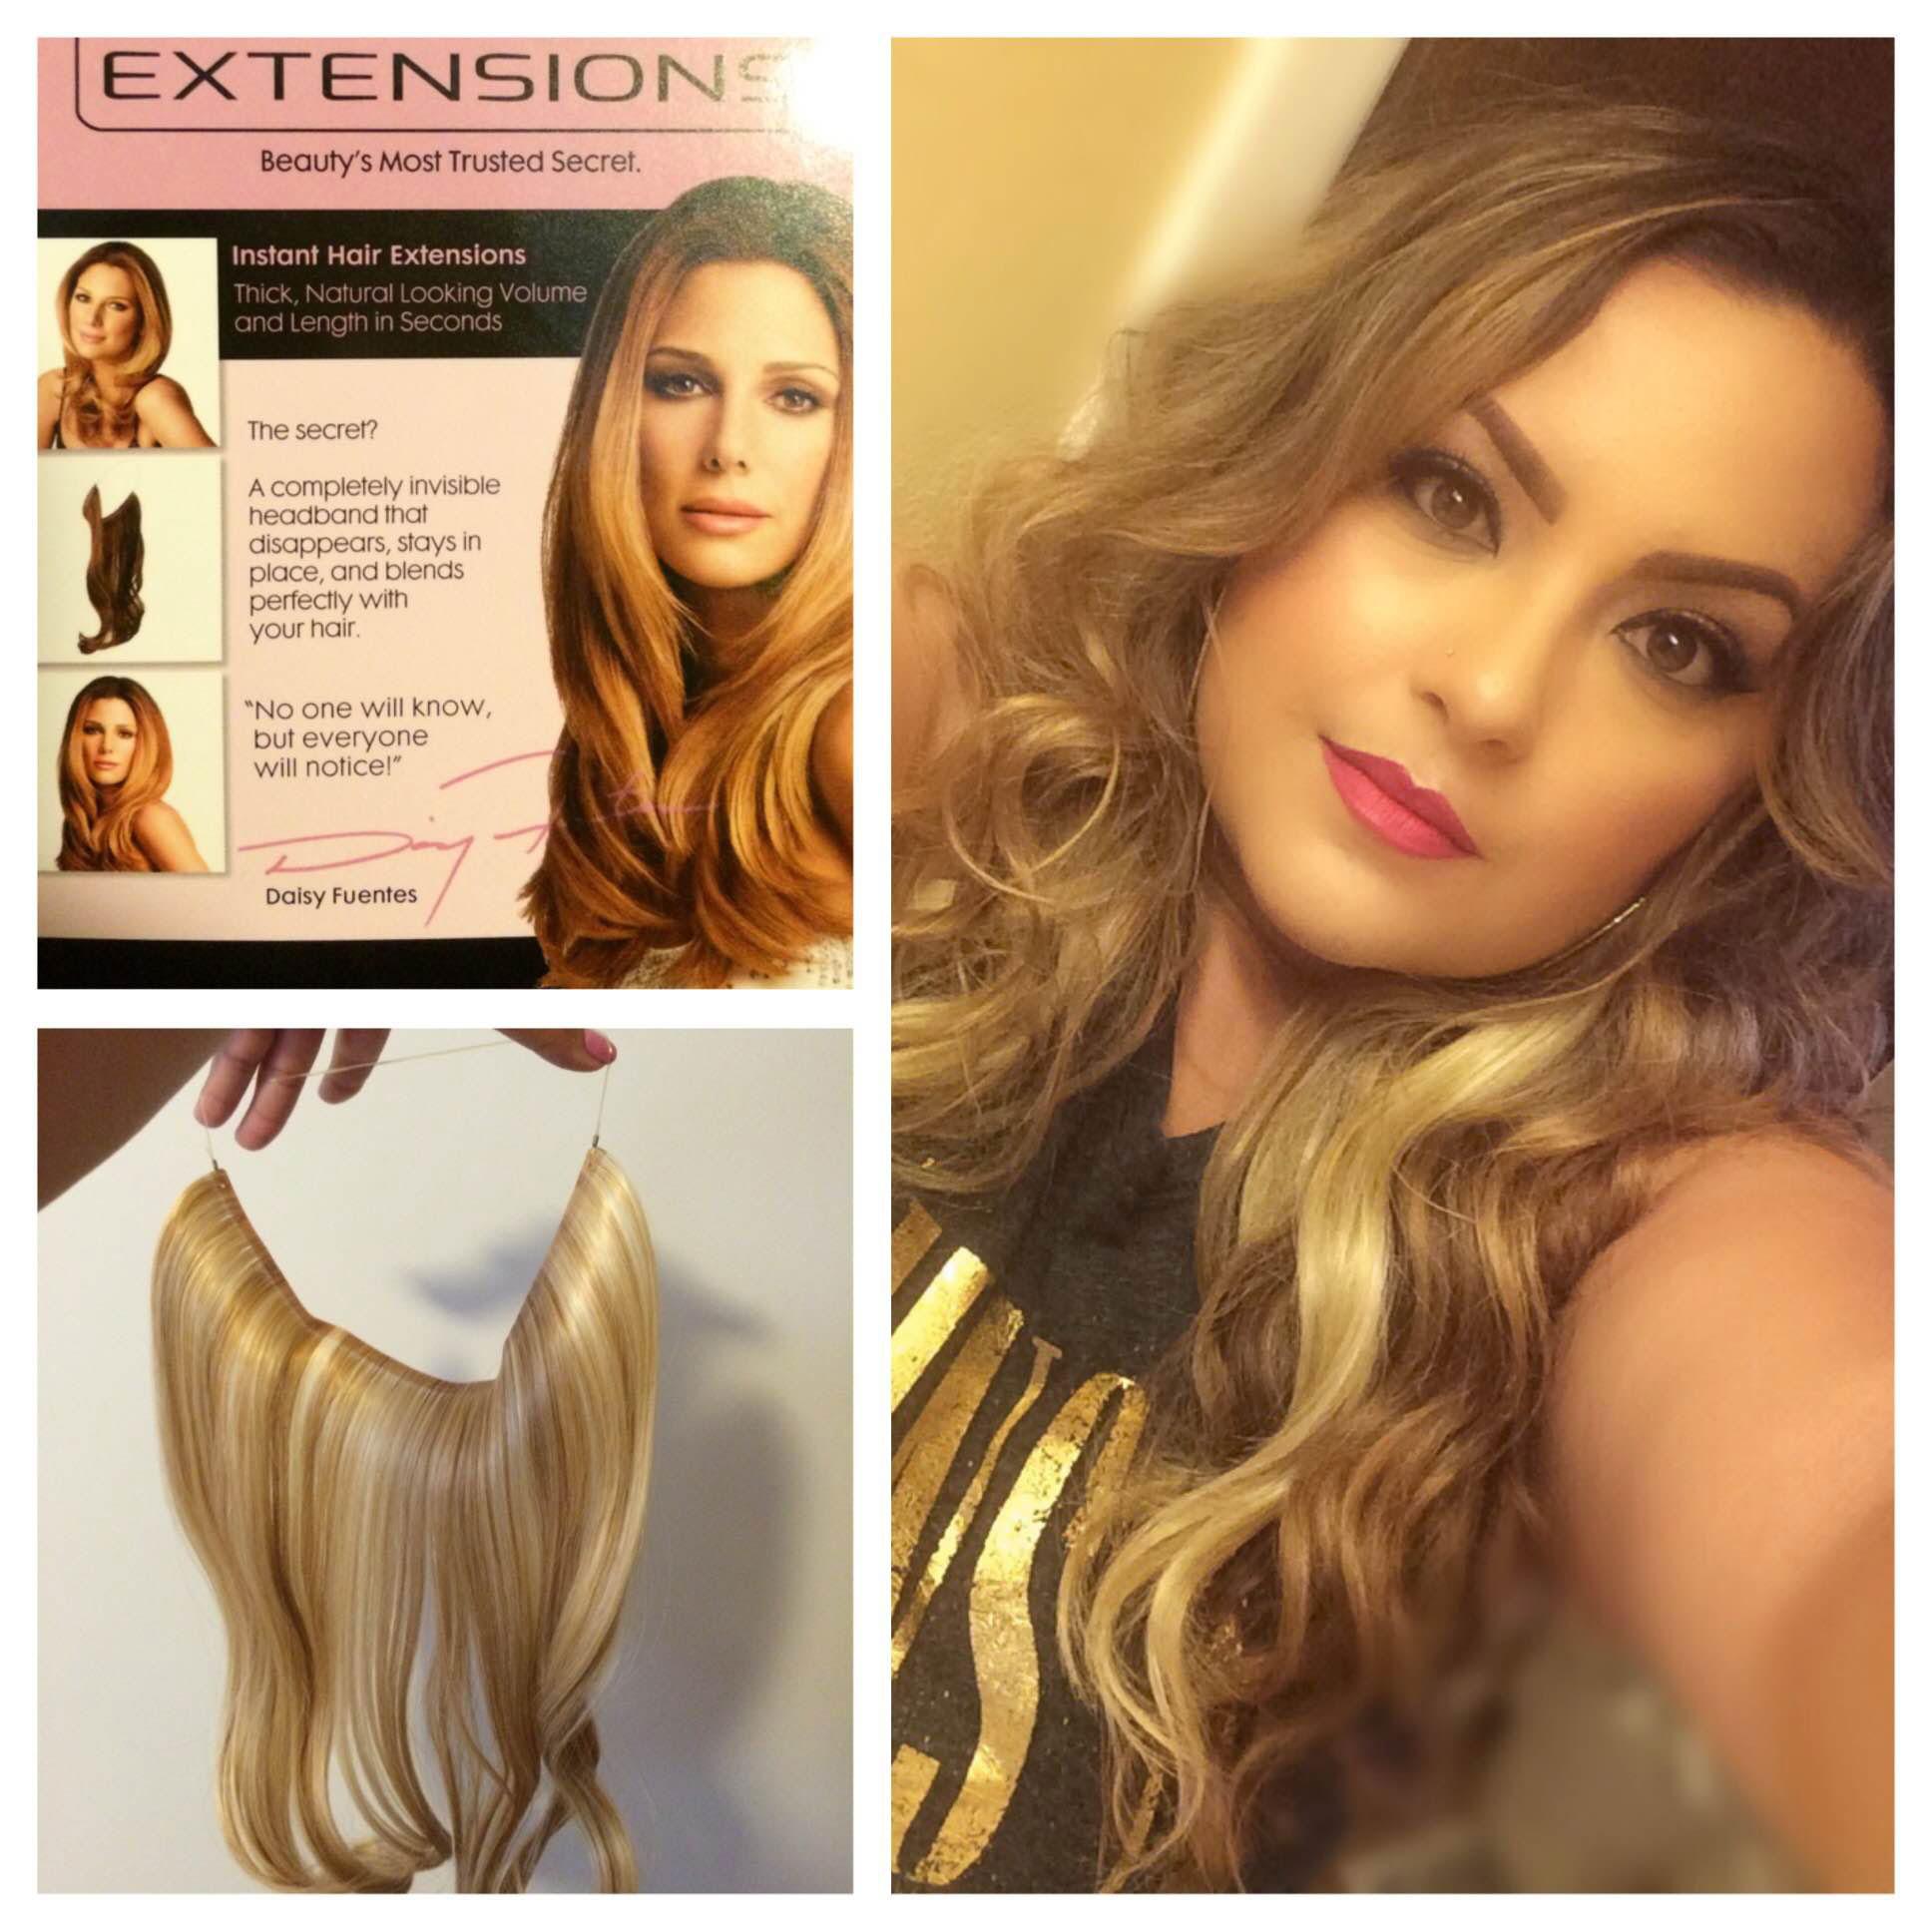 Secret extensions reviews for short hair